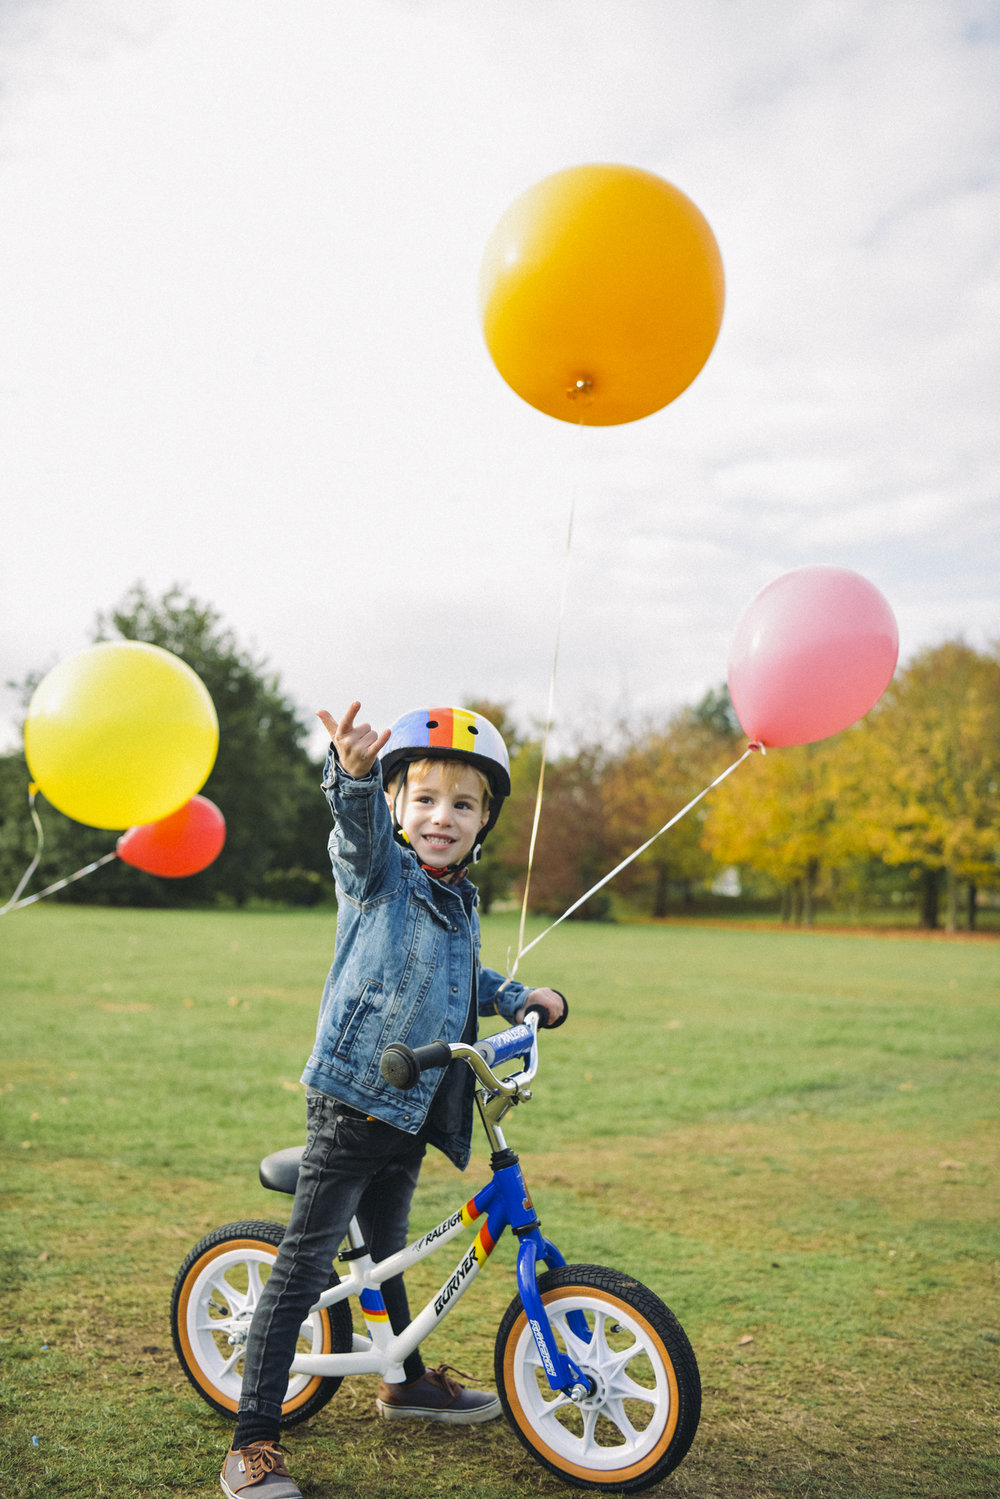 Raleigh Kids Balloon Image1.jpg